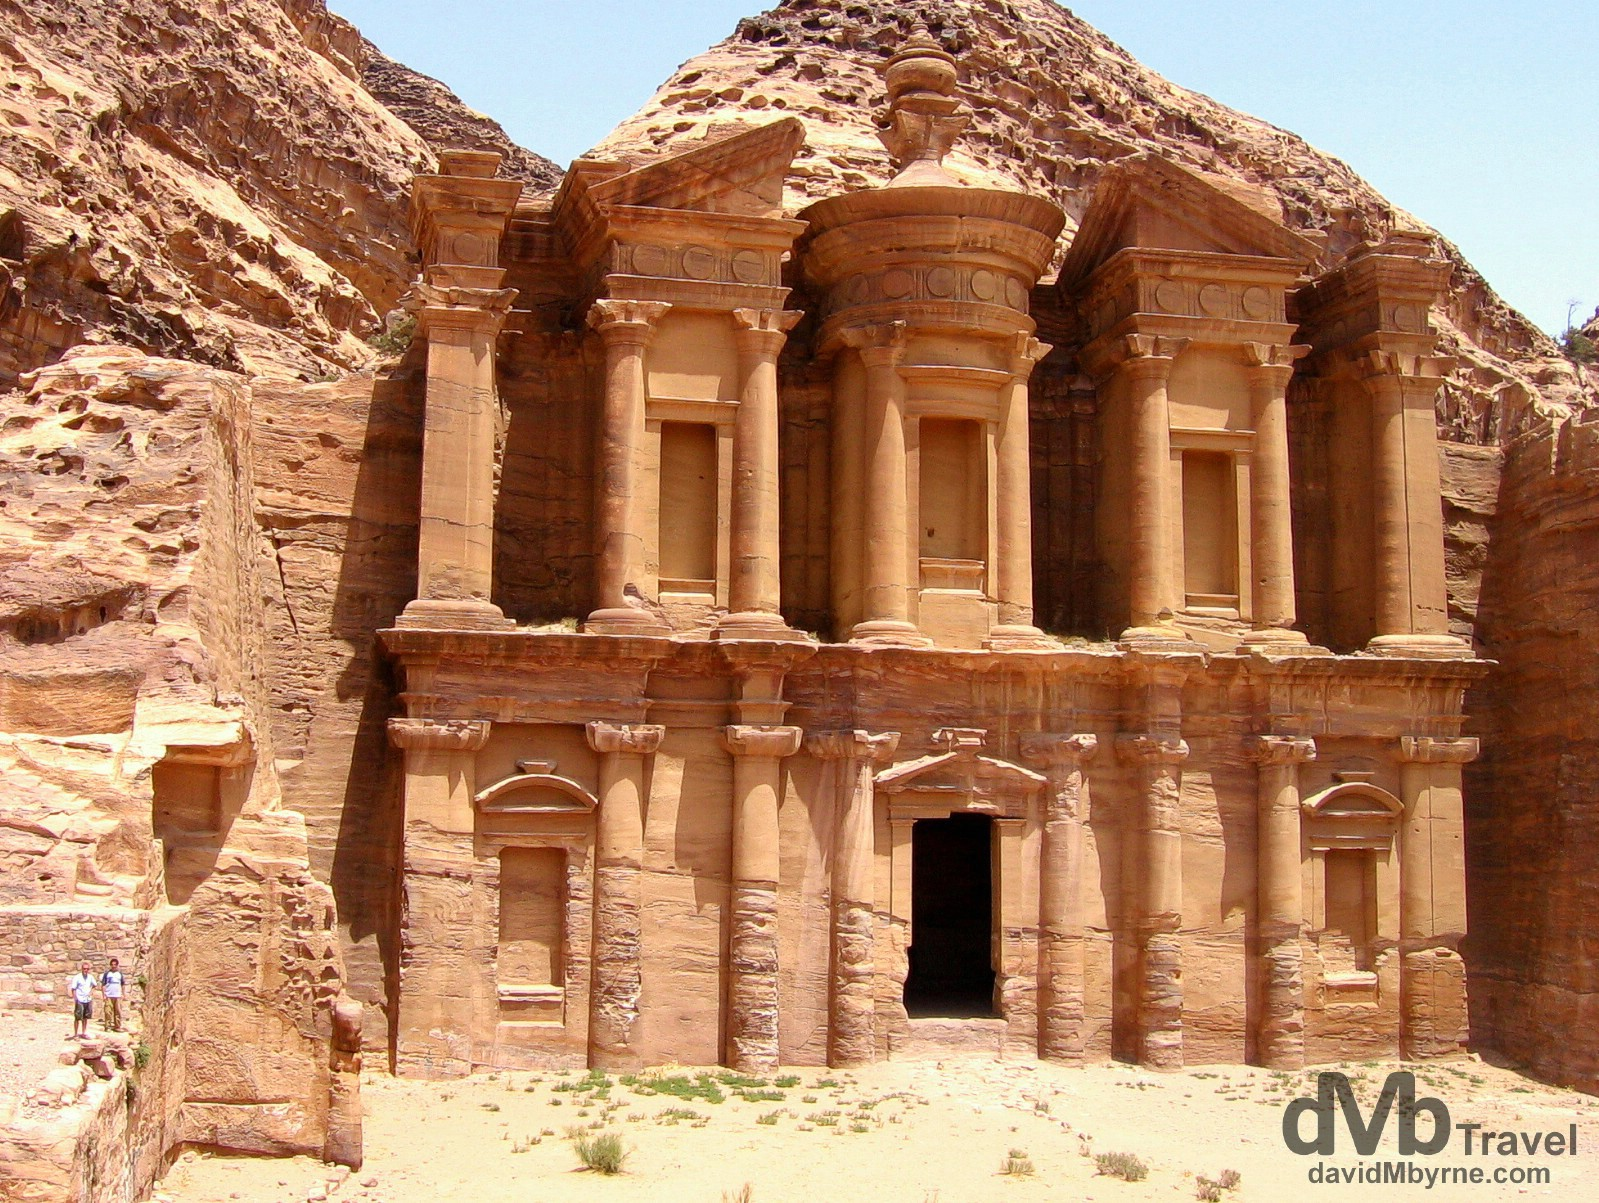 El Deir (The Monastery), one of the largest buildings in Petra, Jordan. April 27, 2008.